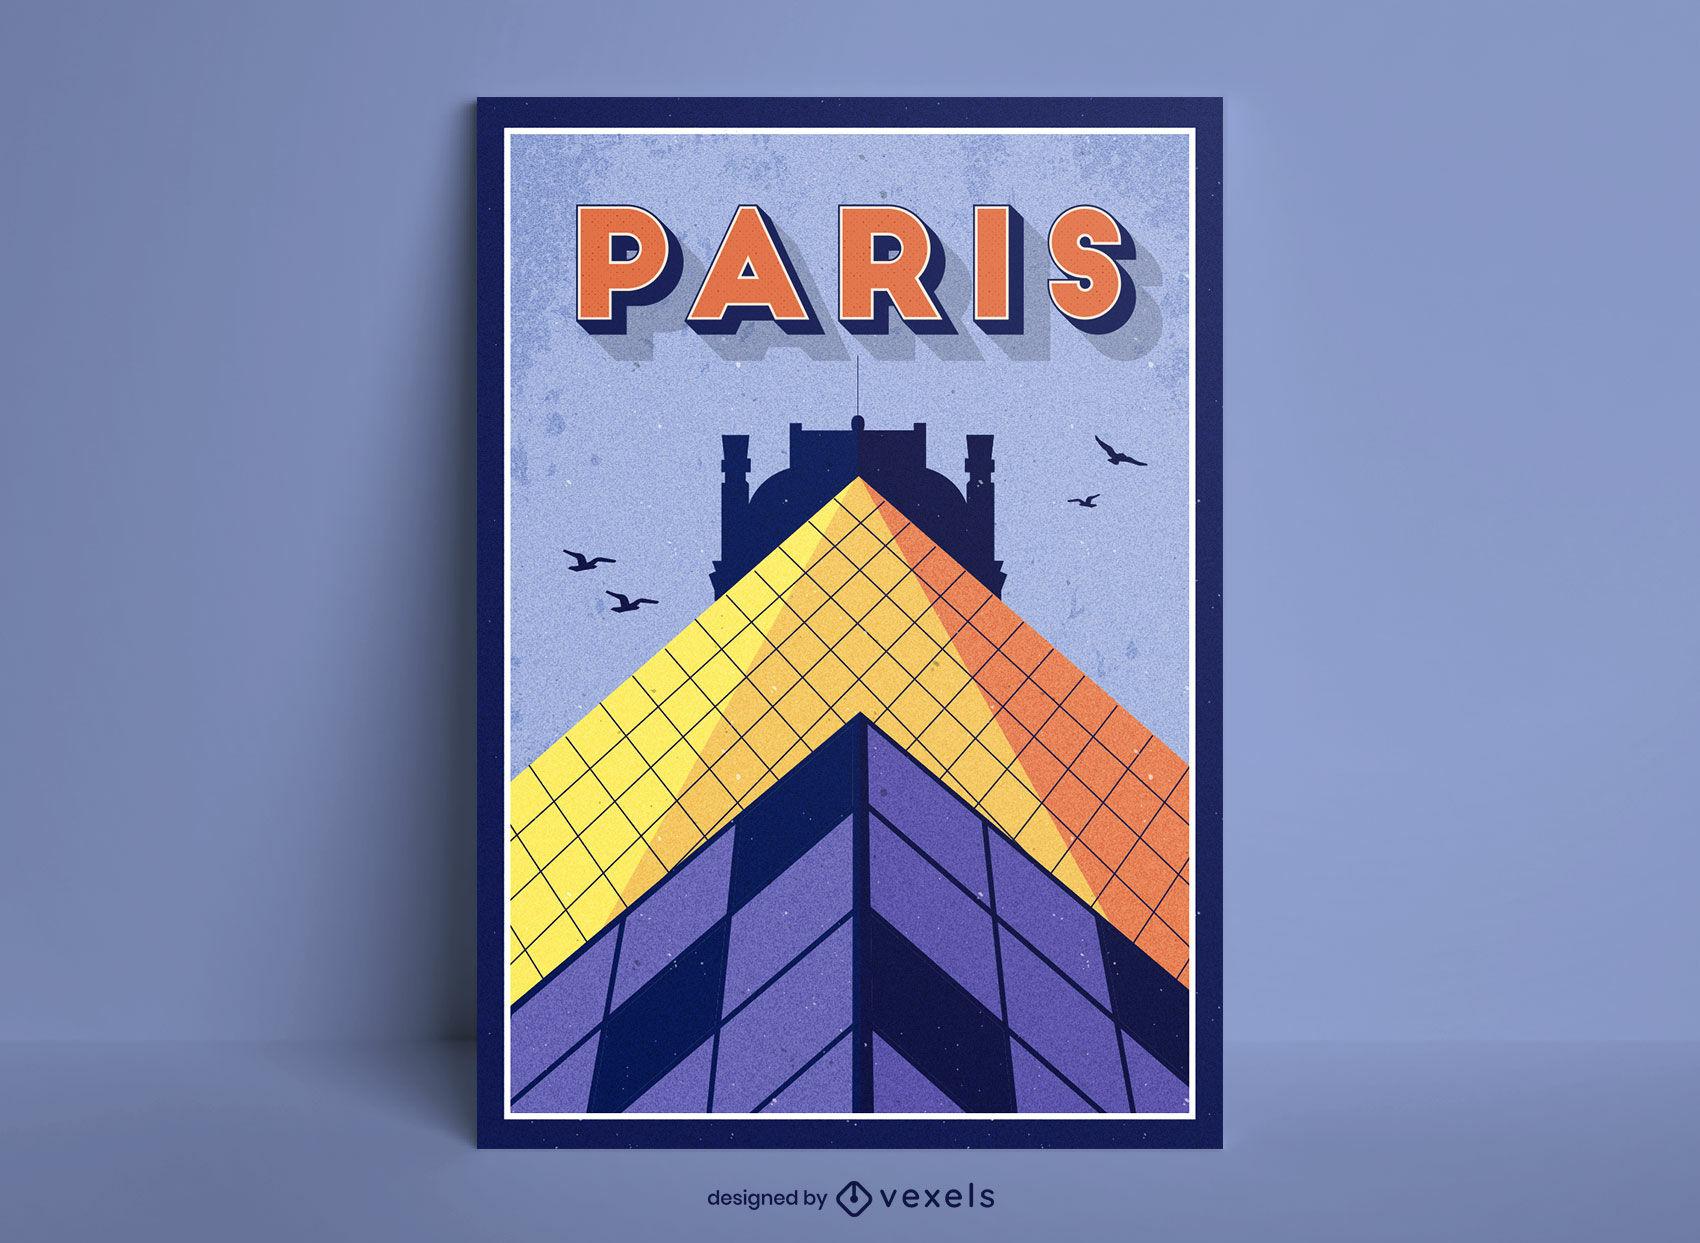 Paris france building travel poster design